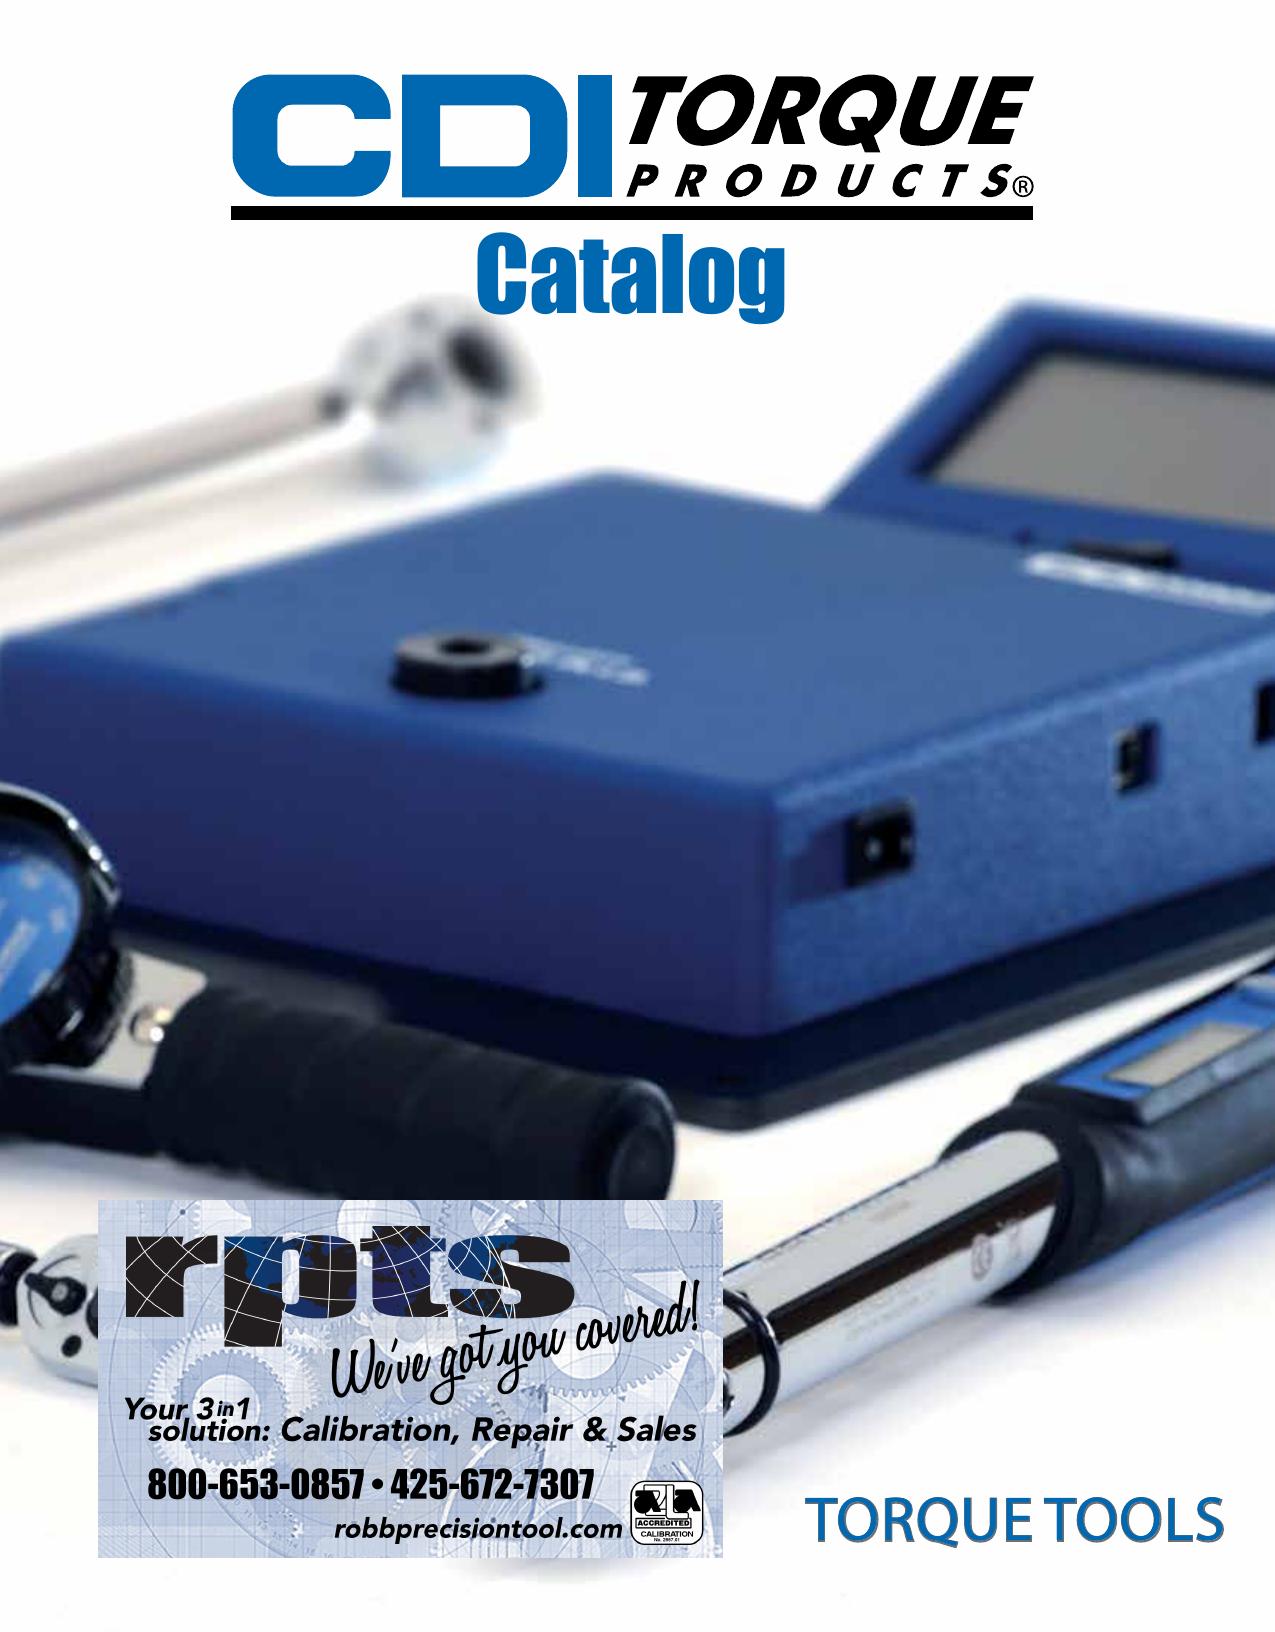 CDI Torque TCQZO60ADP 1-7//8-Inch Open End Dual Pin Z Head Snap-on Industrial Brand CDI Torque